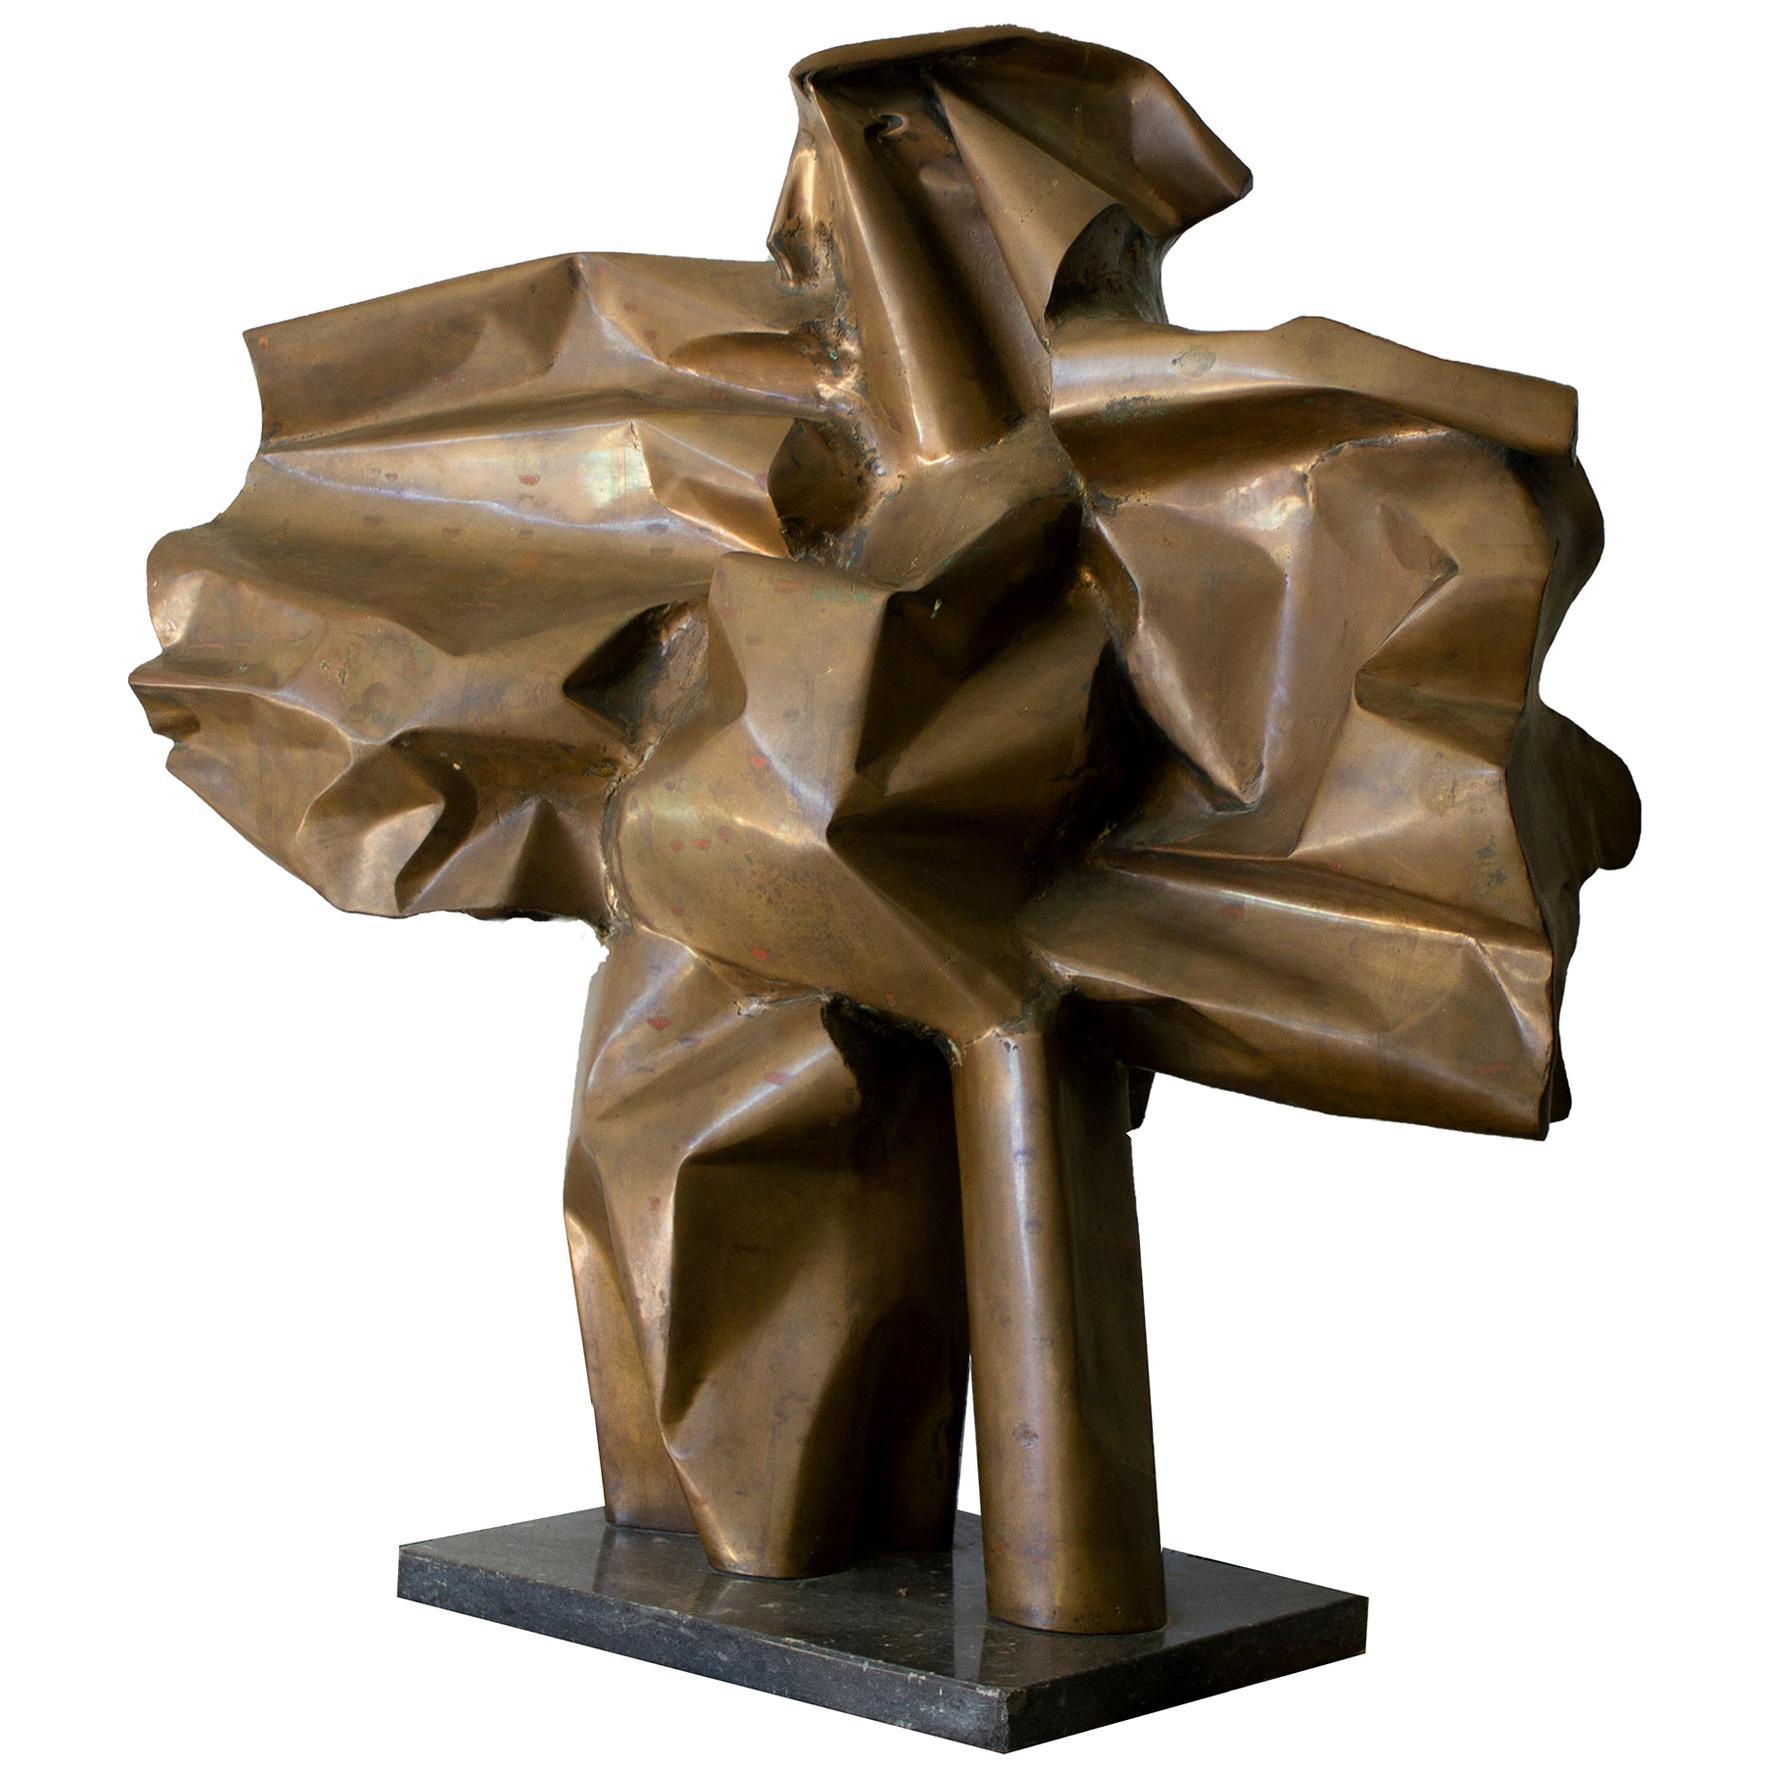 Abbott Pattison Sculpture Abstract Bronze Titled 'Flight' 1977, Large Scale